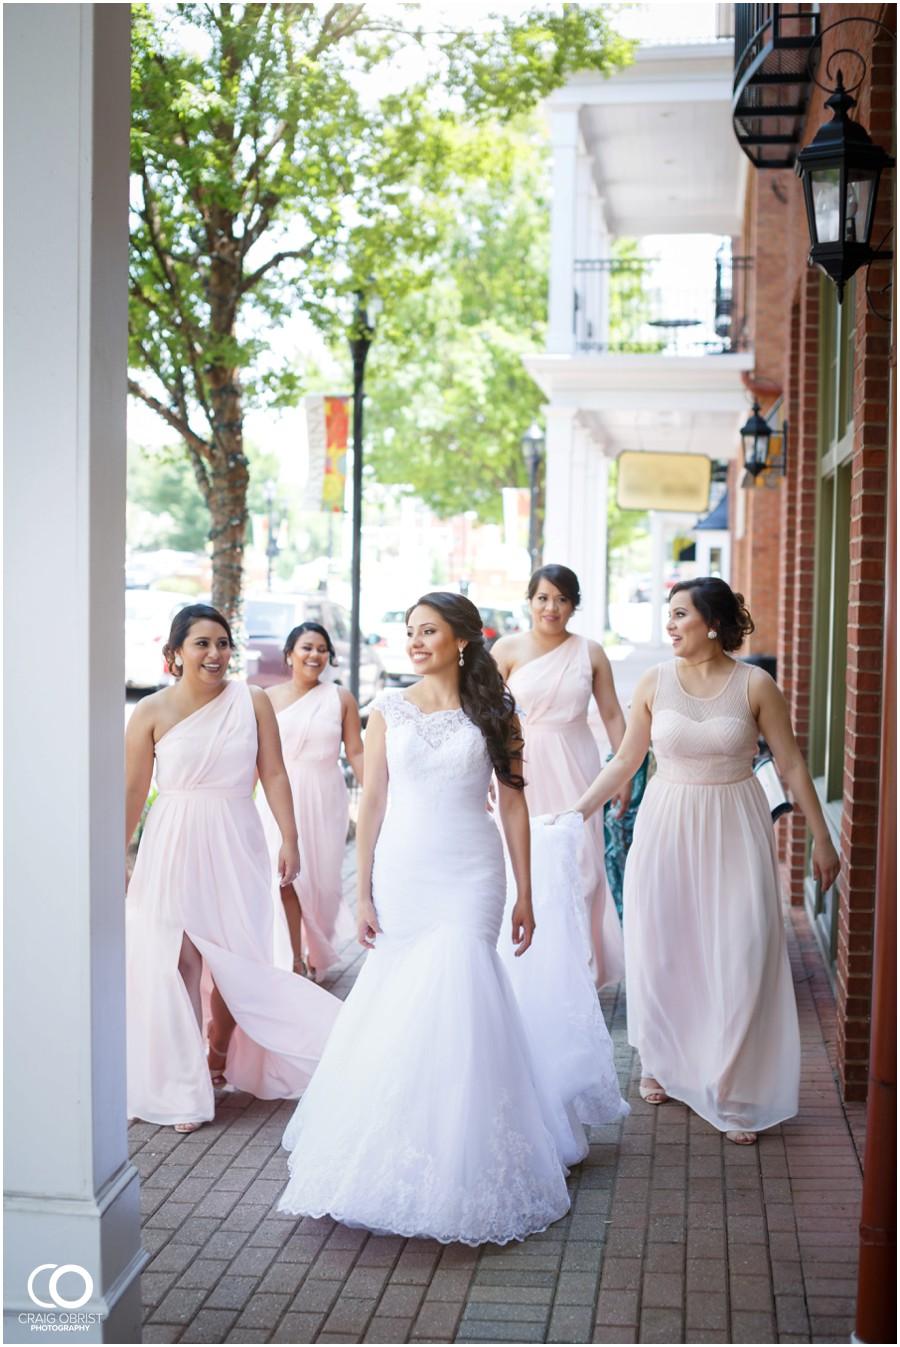 The Biltmore Wedding Portraits Atlanta Georgia_0031.jpg